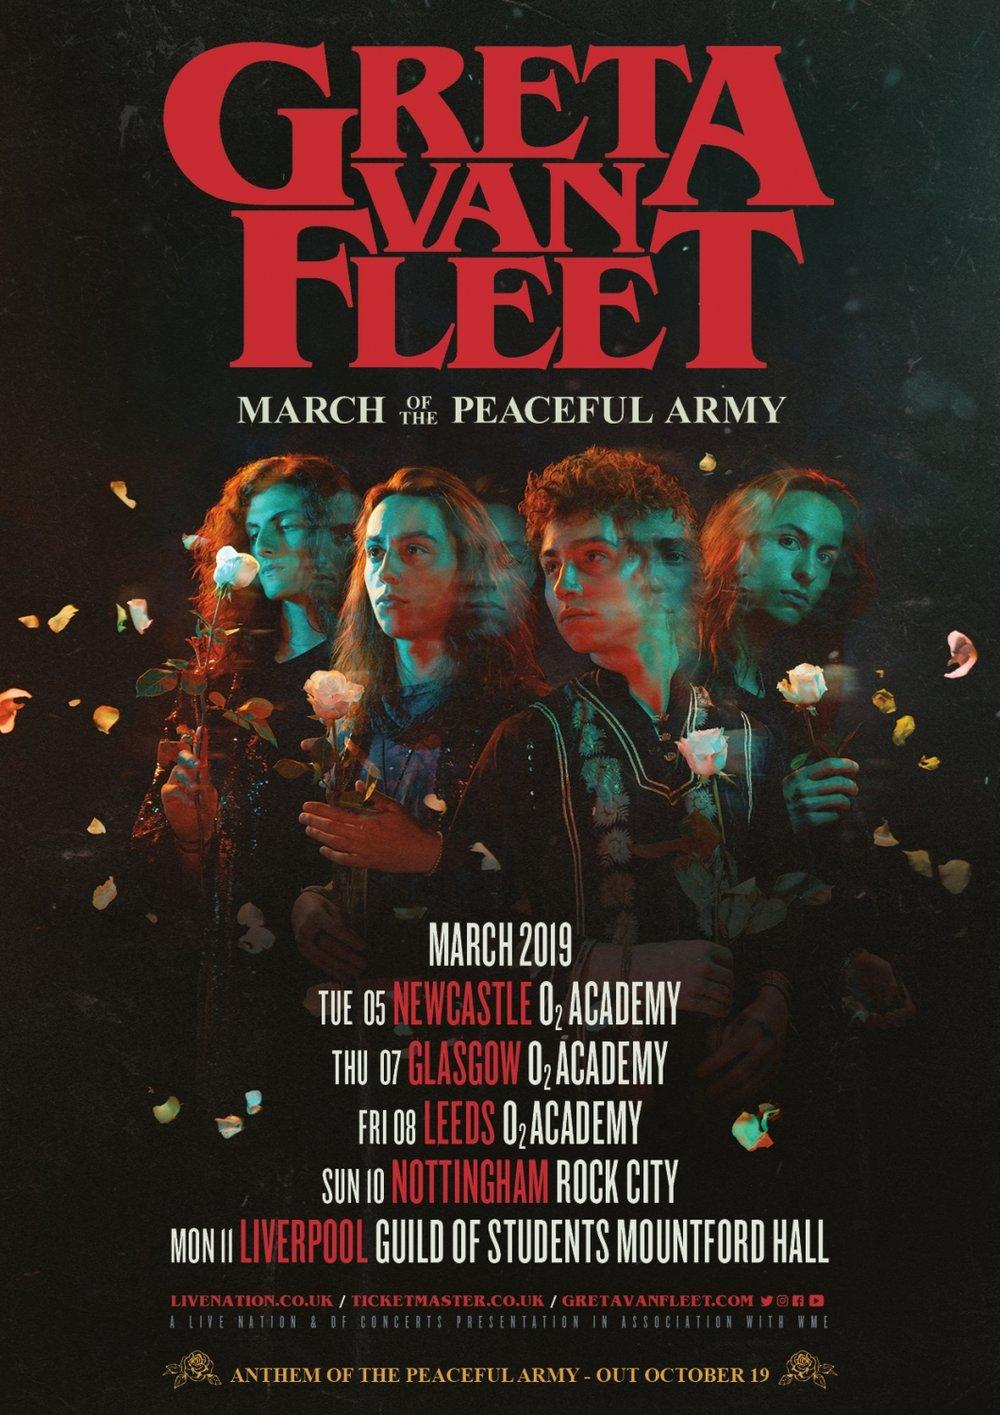 Greta Van Fleet UK Tour Dates 2019 Poster